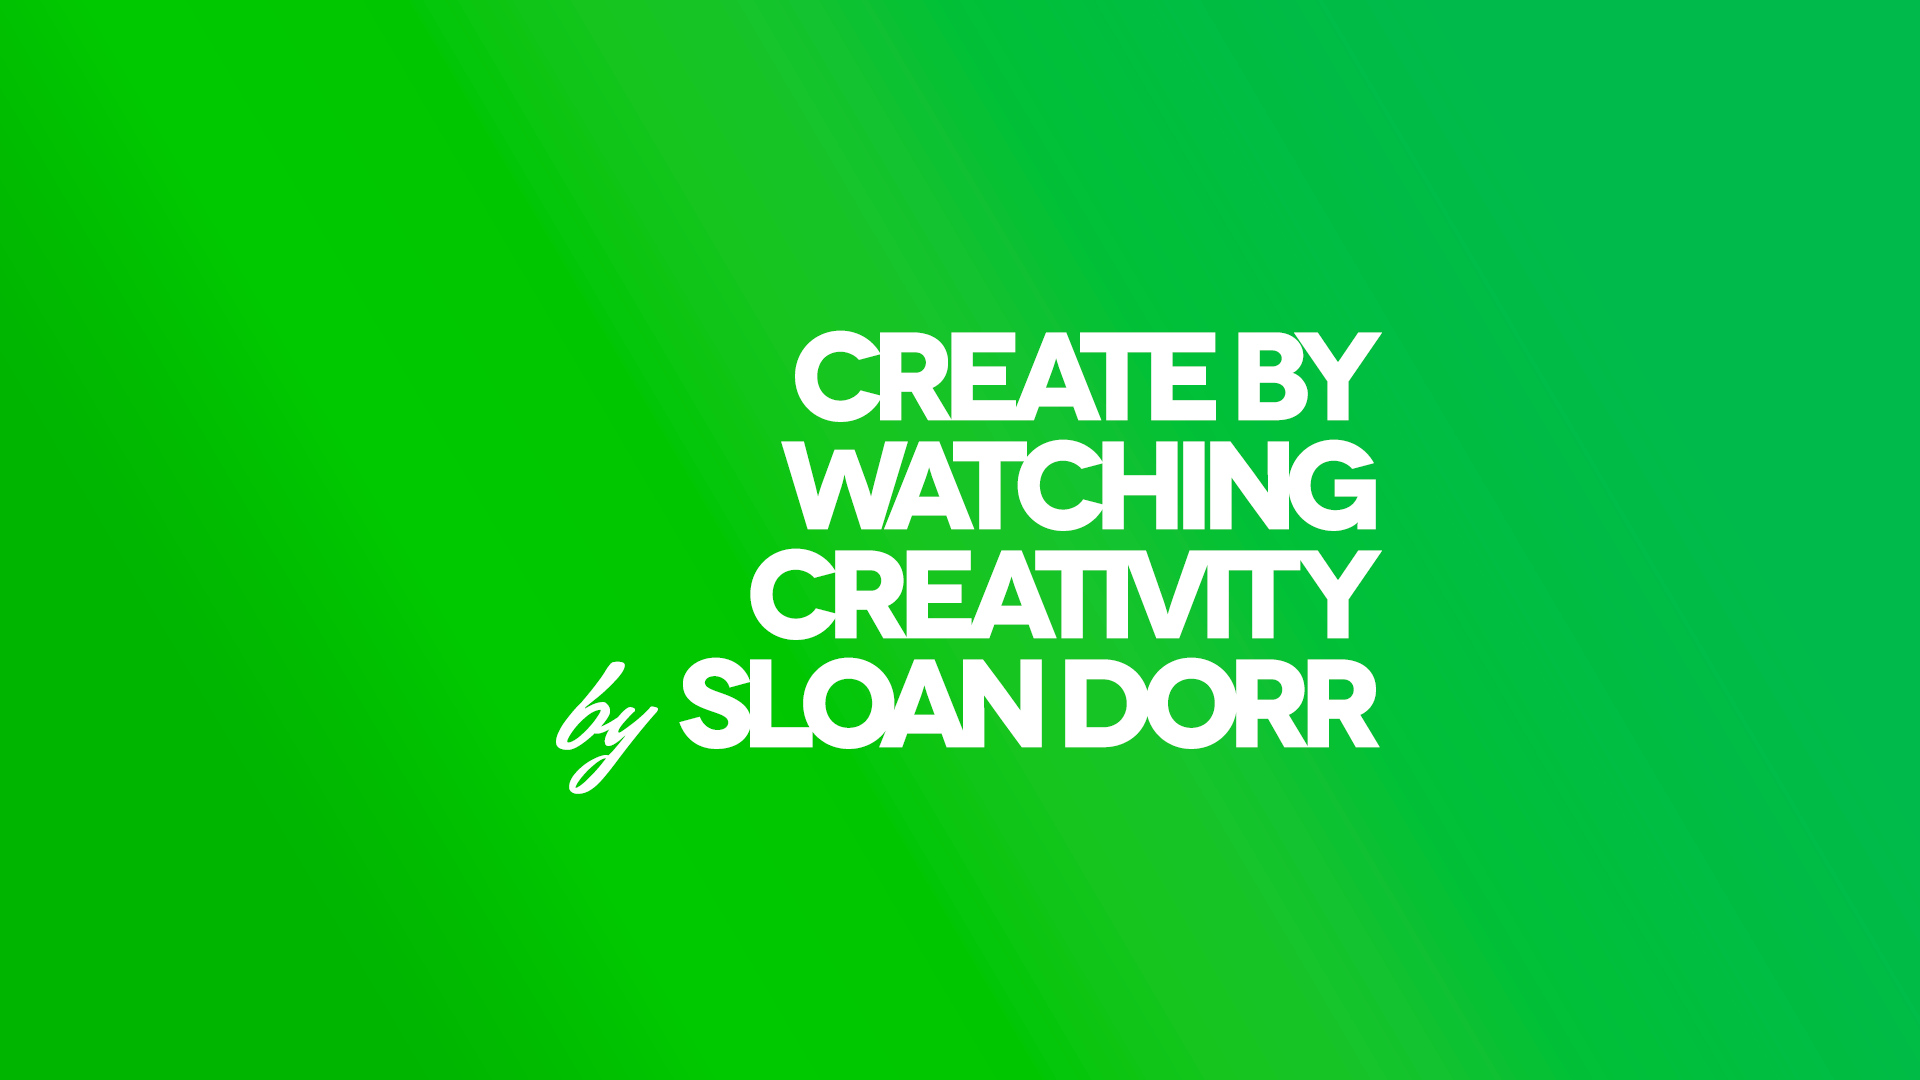 2012-SloanEDorr-Article.png